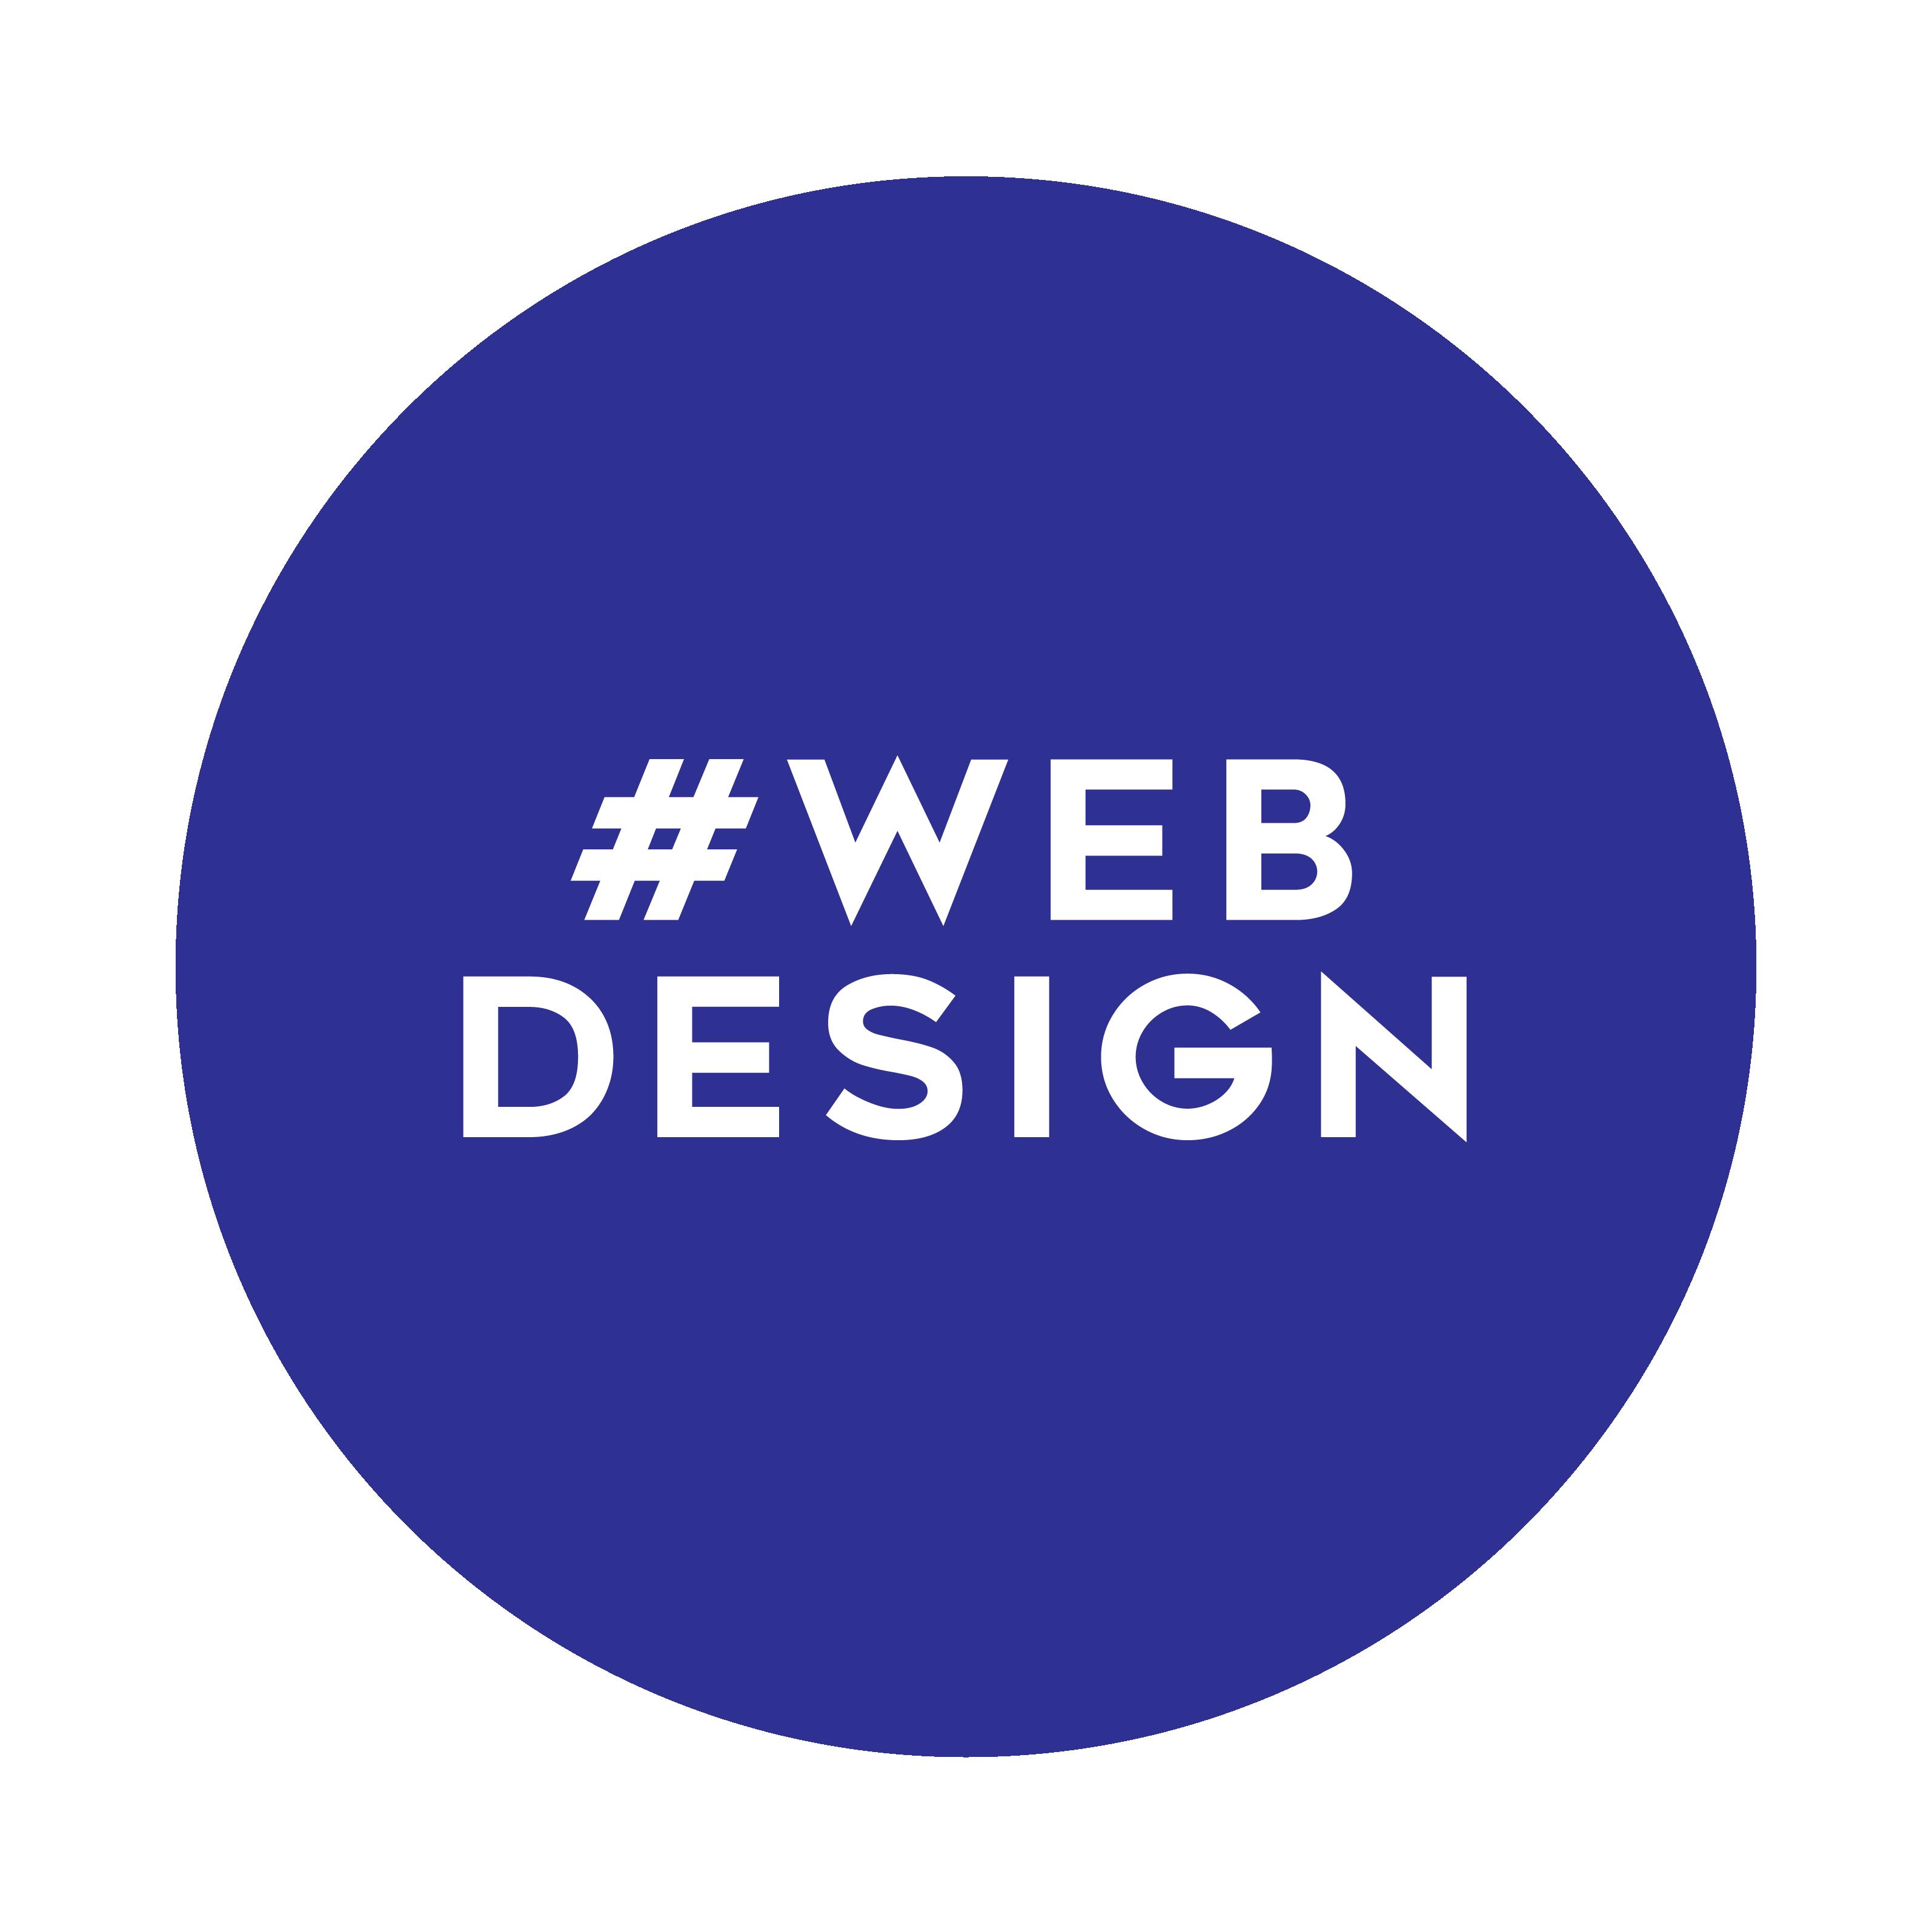 web-design-image